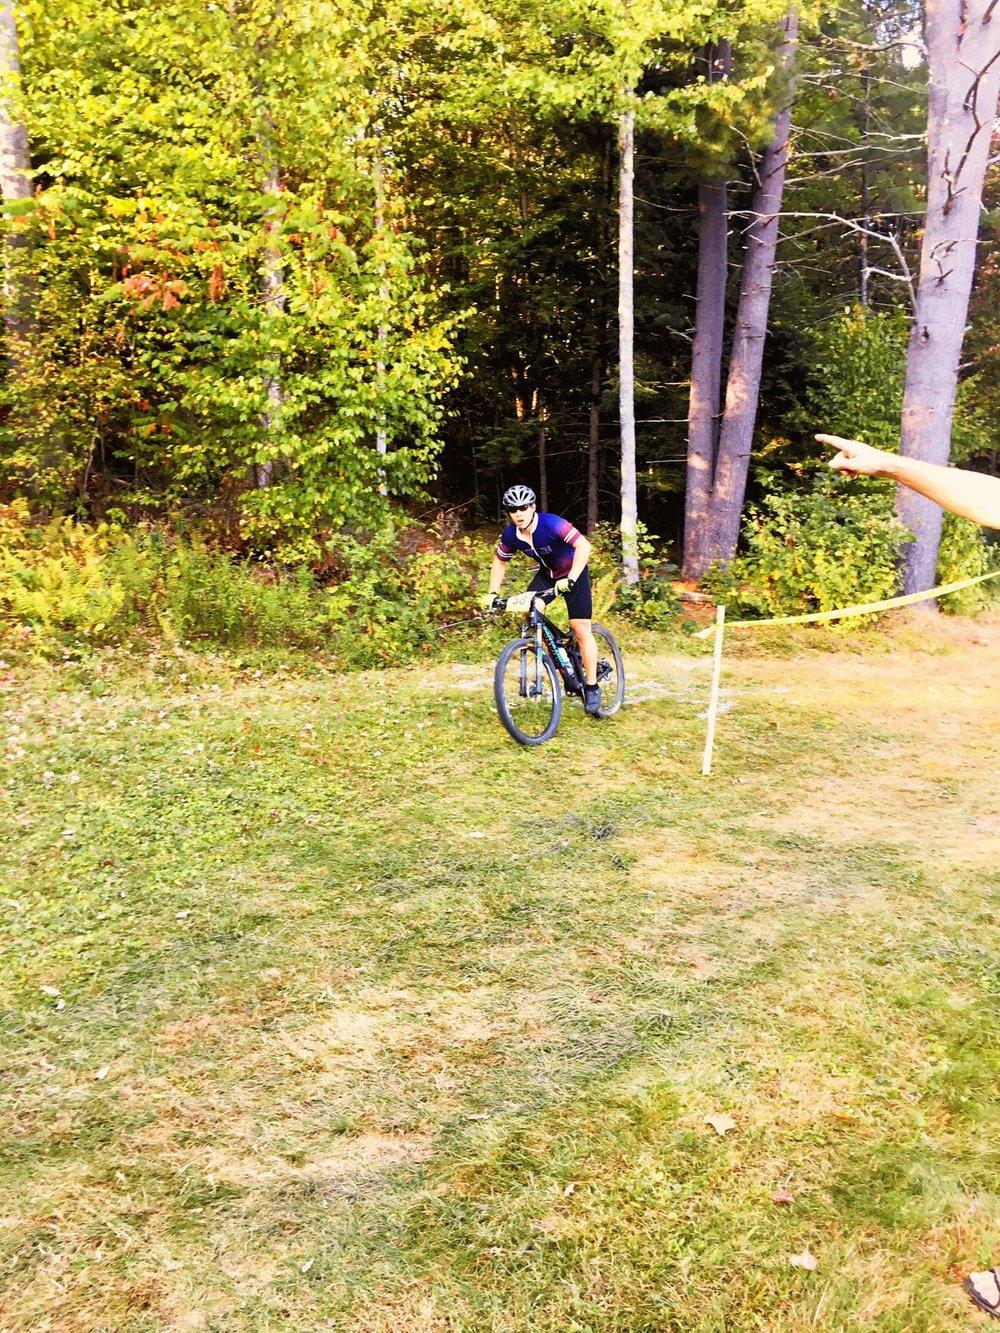 Mountain Biking at Vermont Academy - September 27, 2017  - 7959.JPG